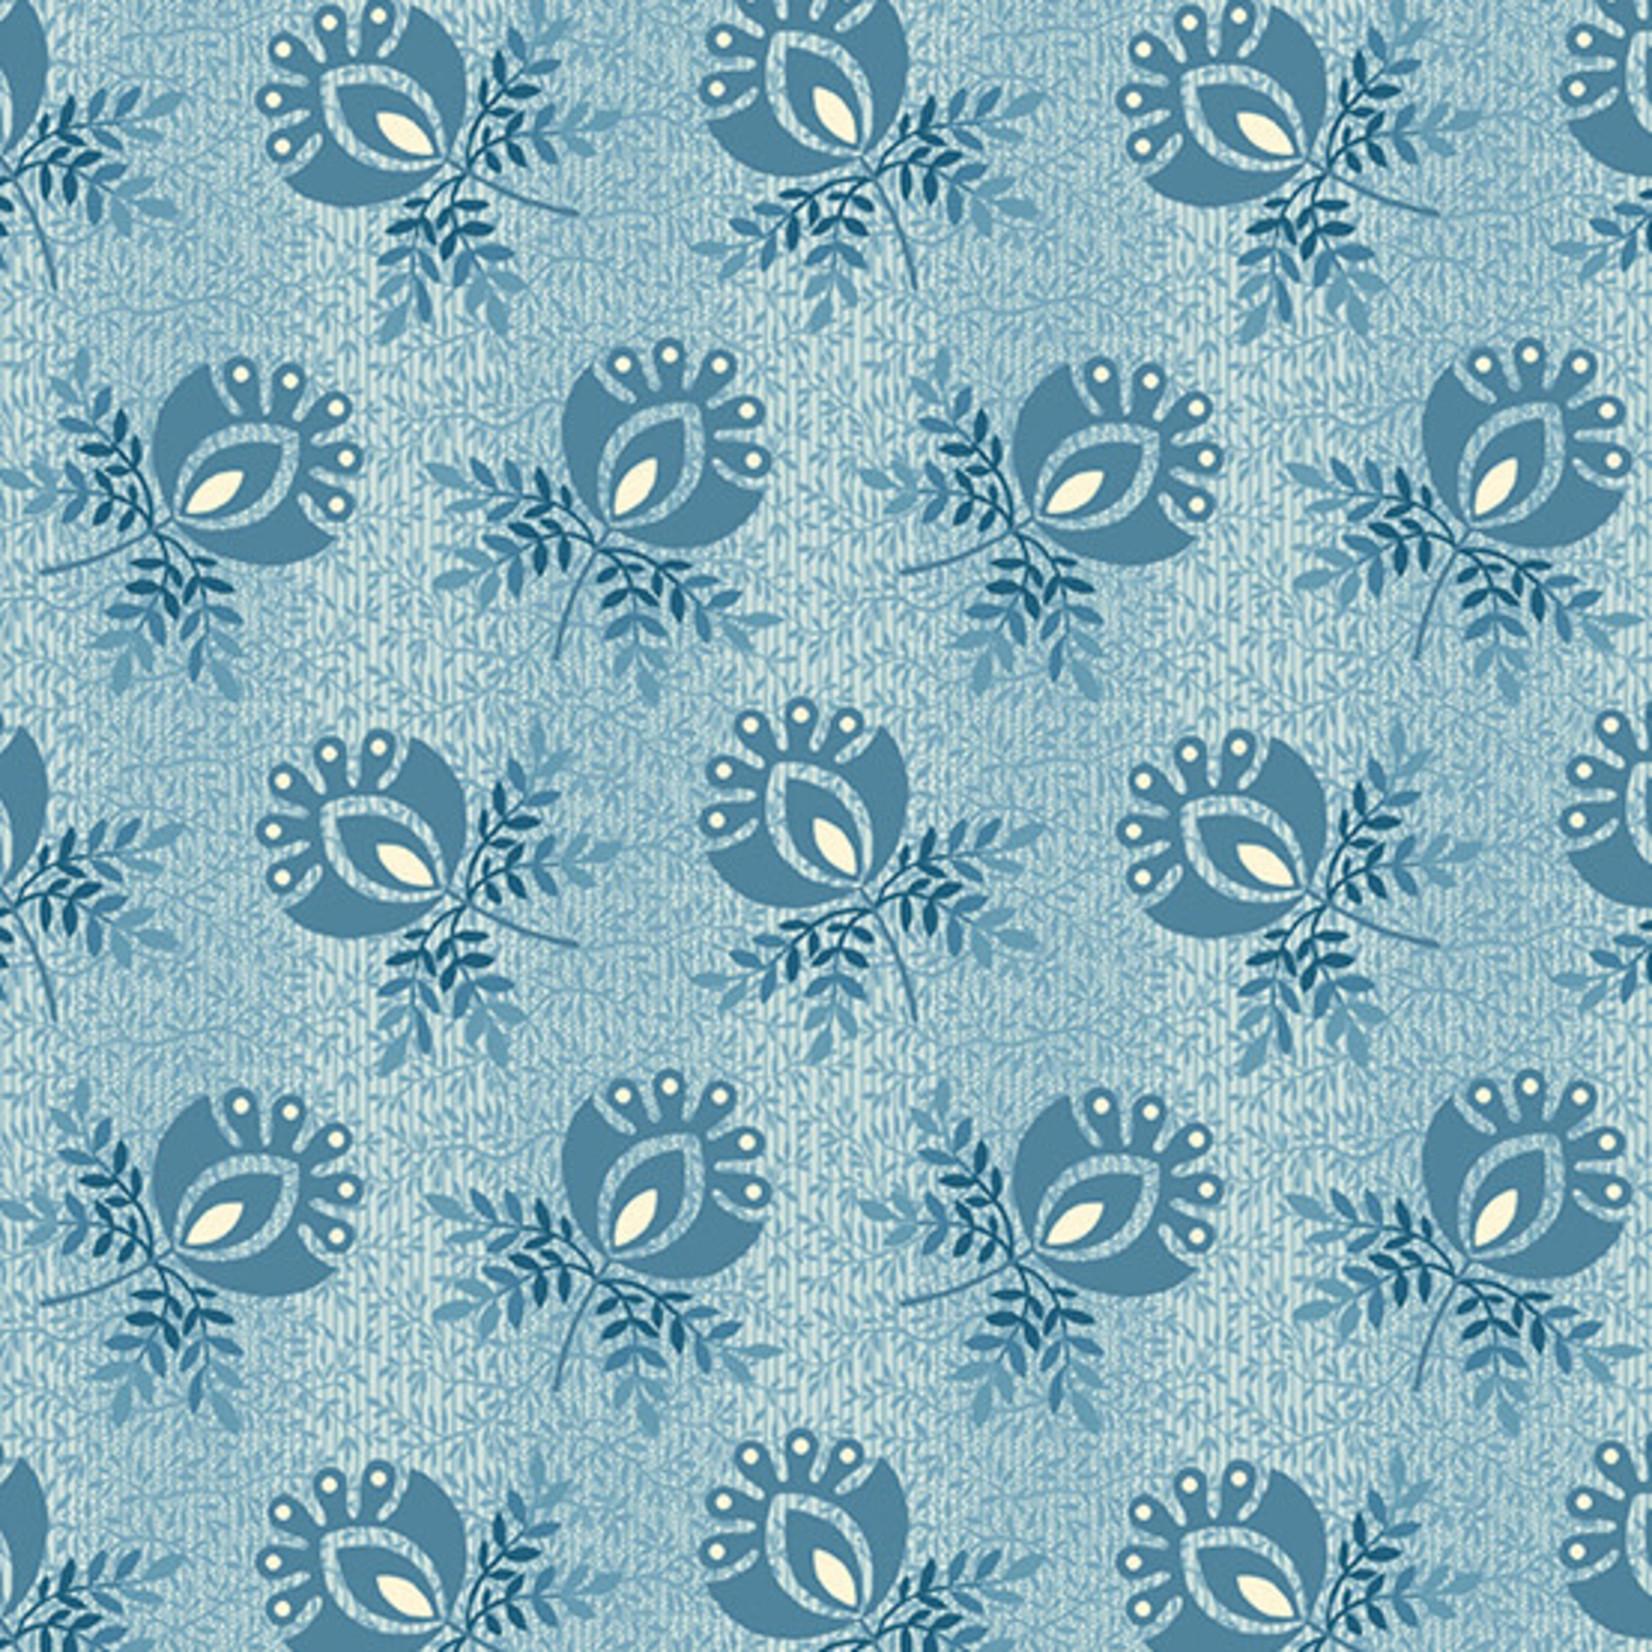 ANDOVER PERFECT UNION, BOUTONNIERE, BLUE FROST (A-9579-B) PER CM or $20/m